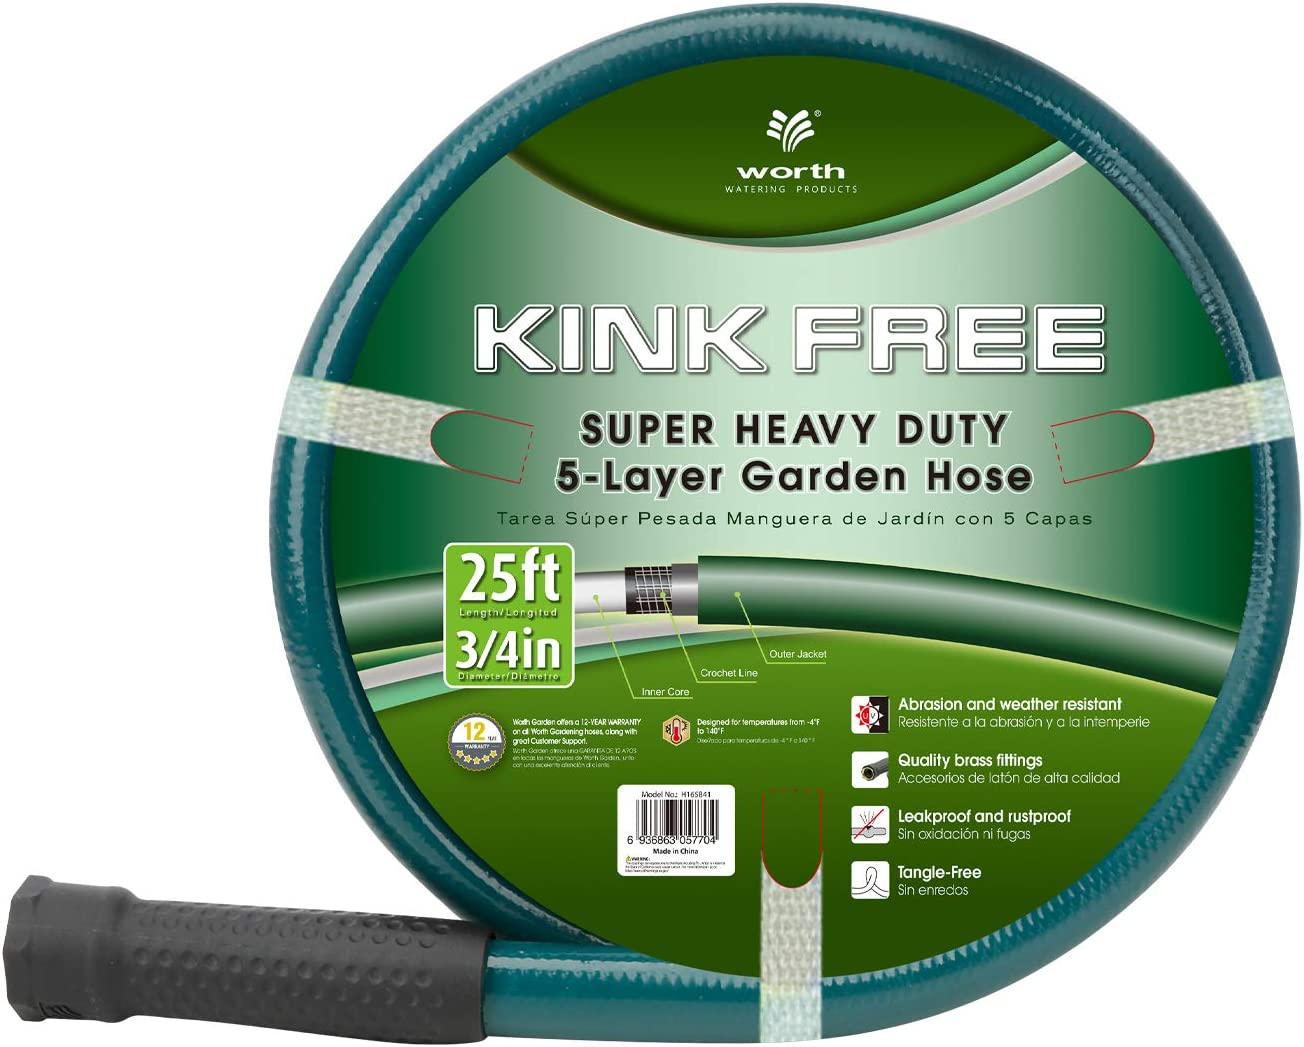 Worth Garden 3/4 in. x 25ft Garden Hose - Durable PVC Non Kinking Heavy Duty Water Hose with Brass Hose Fittings - Dark Green - 12 Years Warranty - H165B41